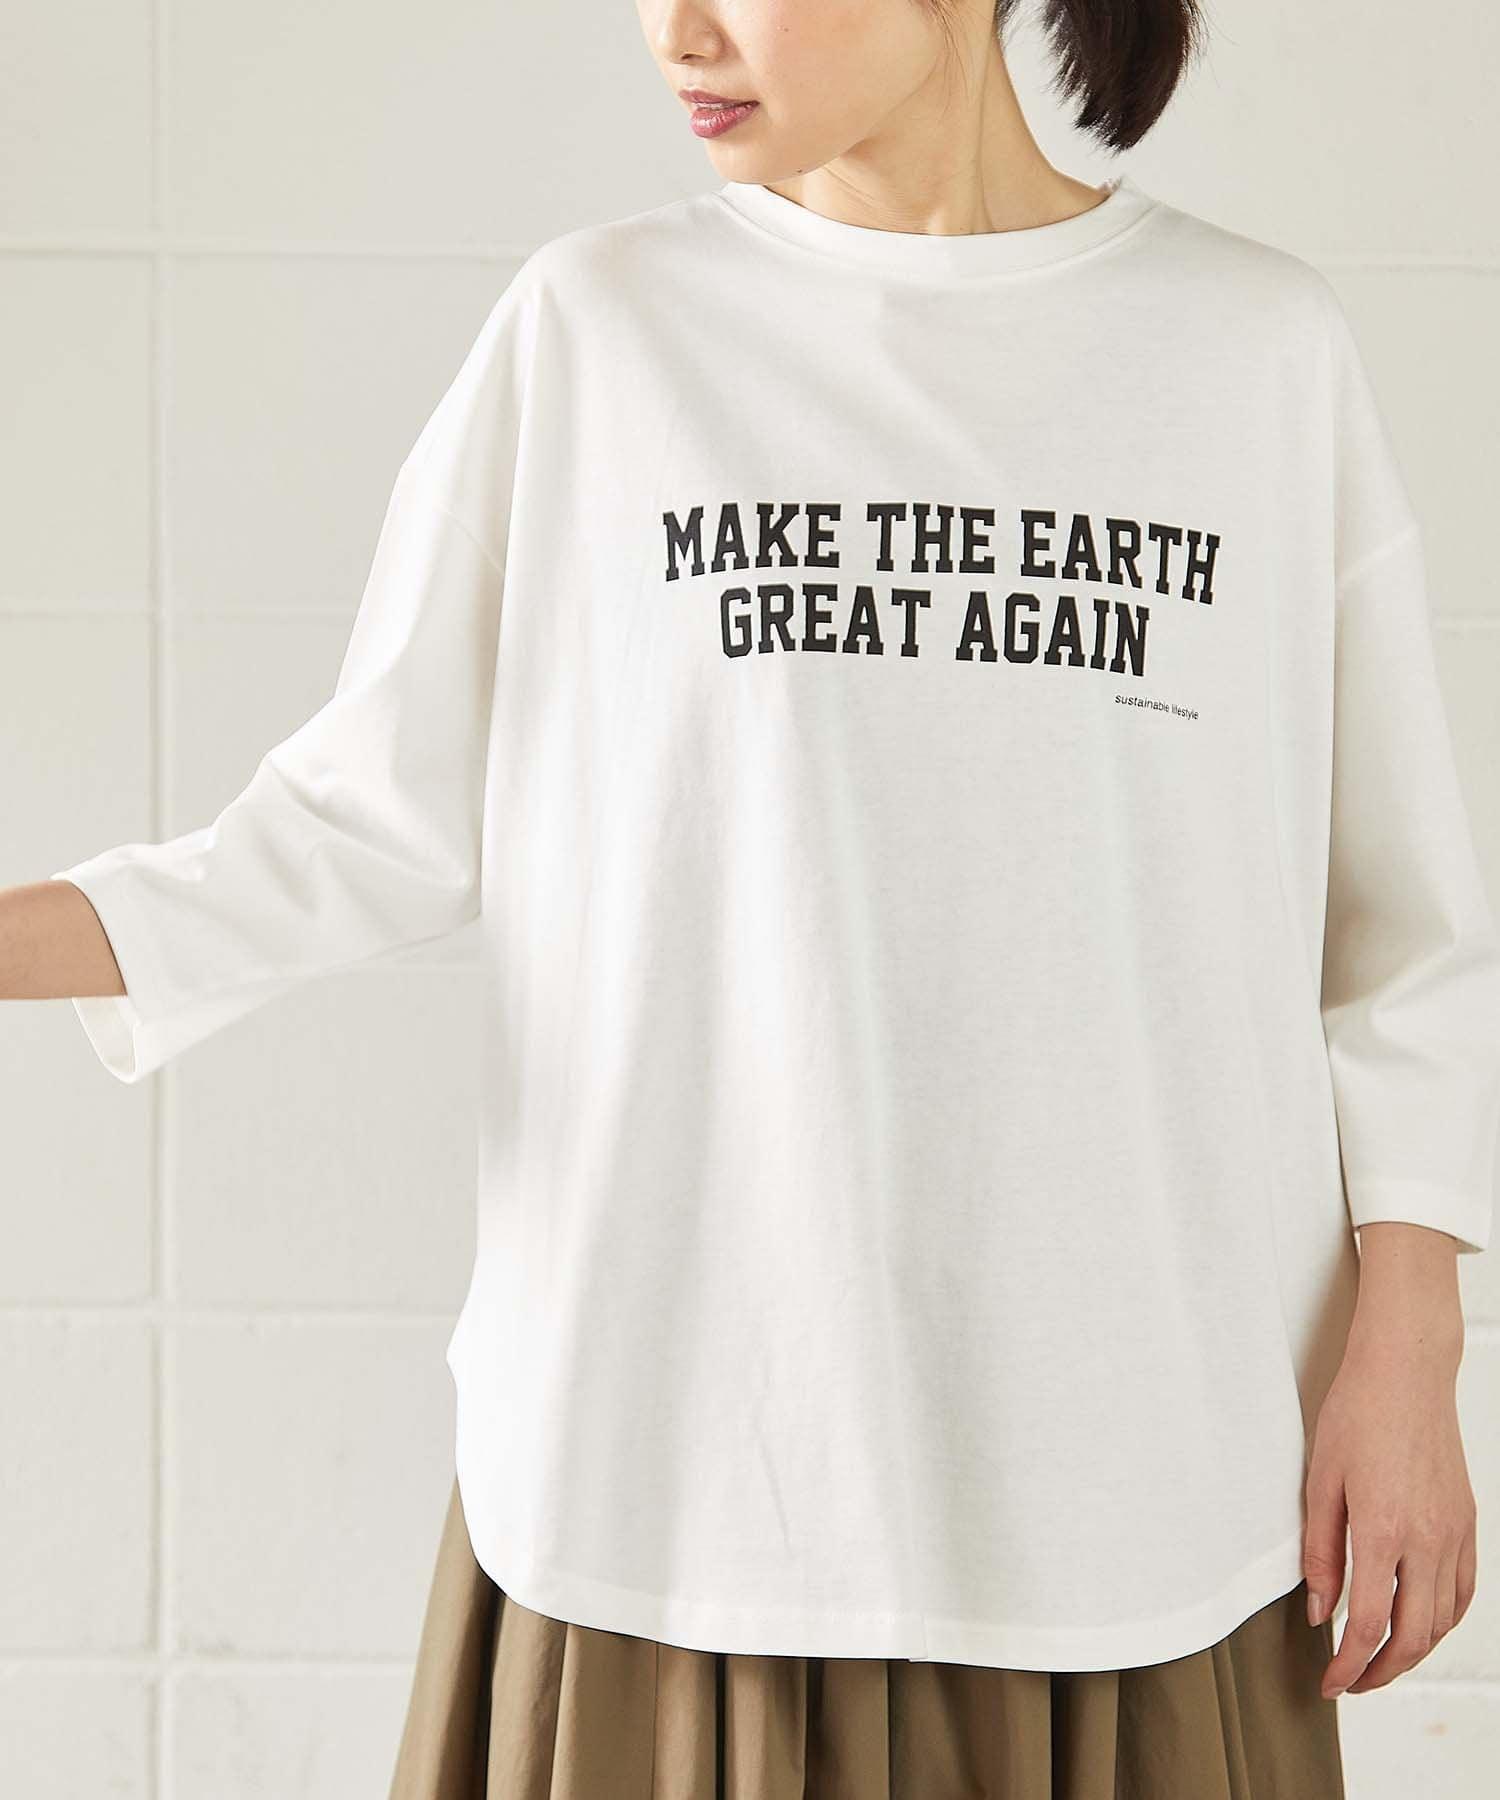 OUVRAGE CLASSE(ウヴラージュクラス) レディース 5分袖ロゴプリントオーバーTシャツ【MAKE THE EARTH】 オフホワイト